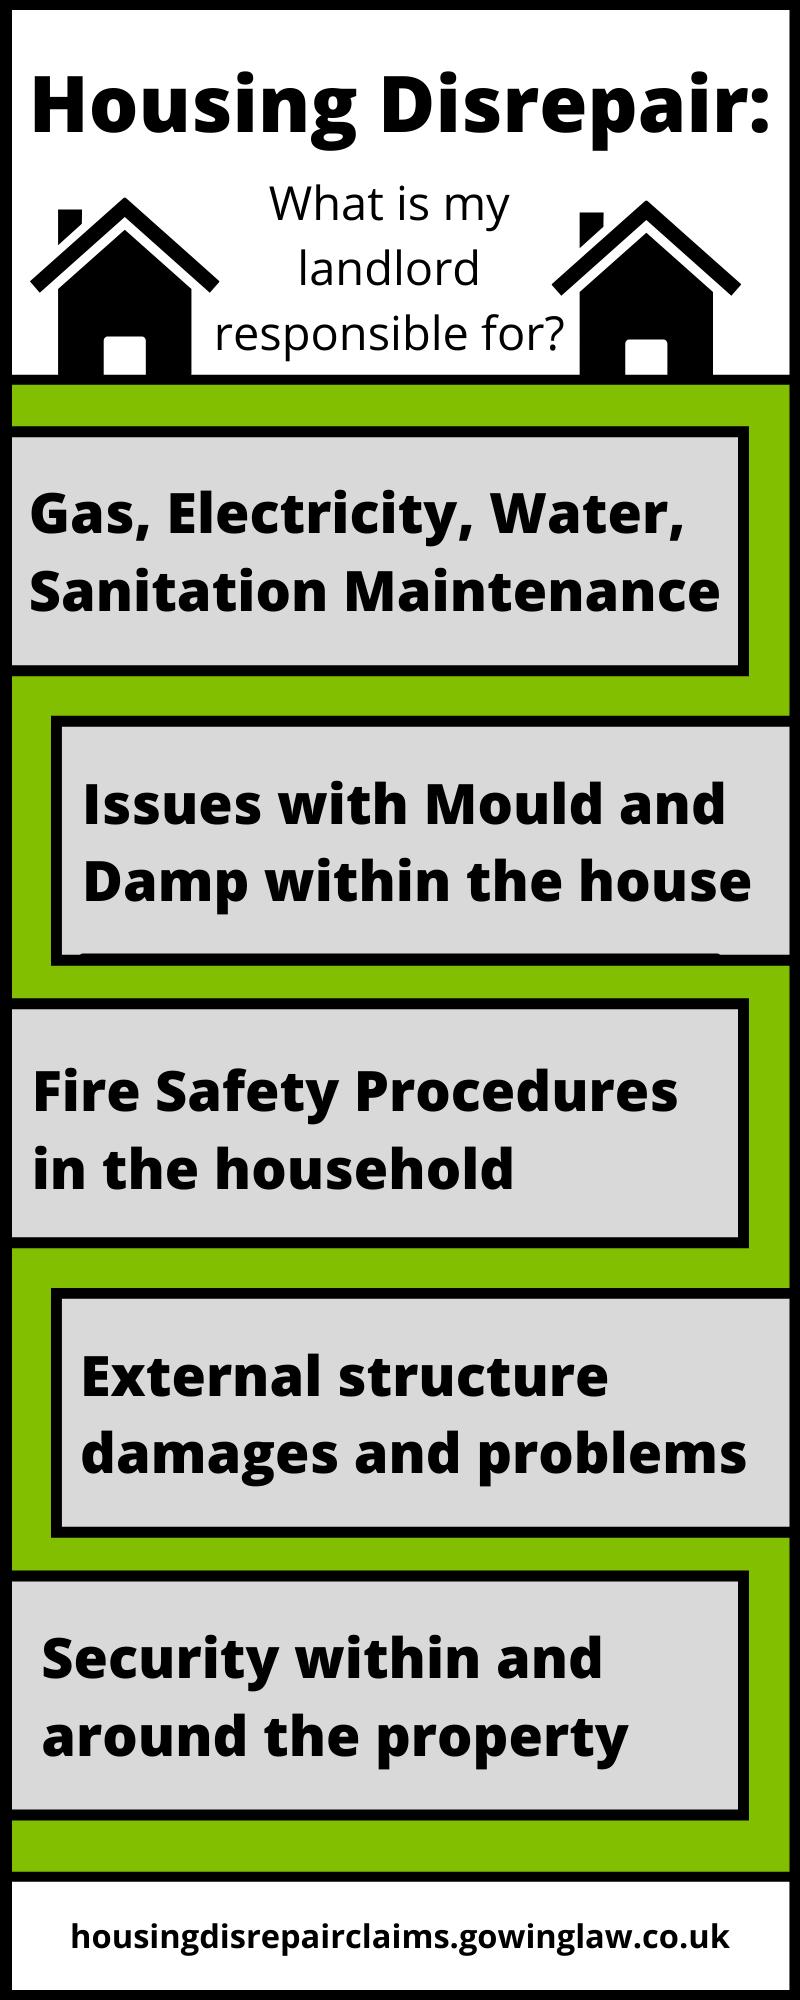 Housing Disrepair Claim Infographic